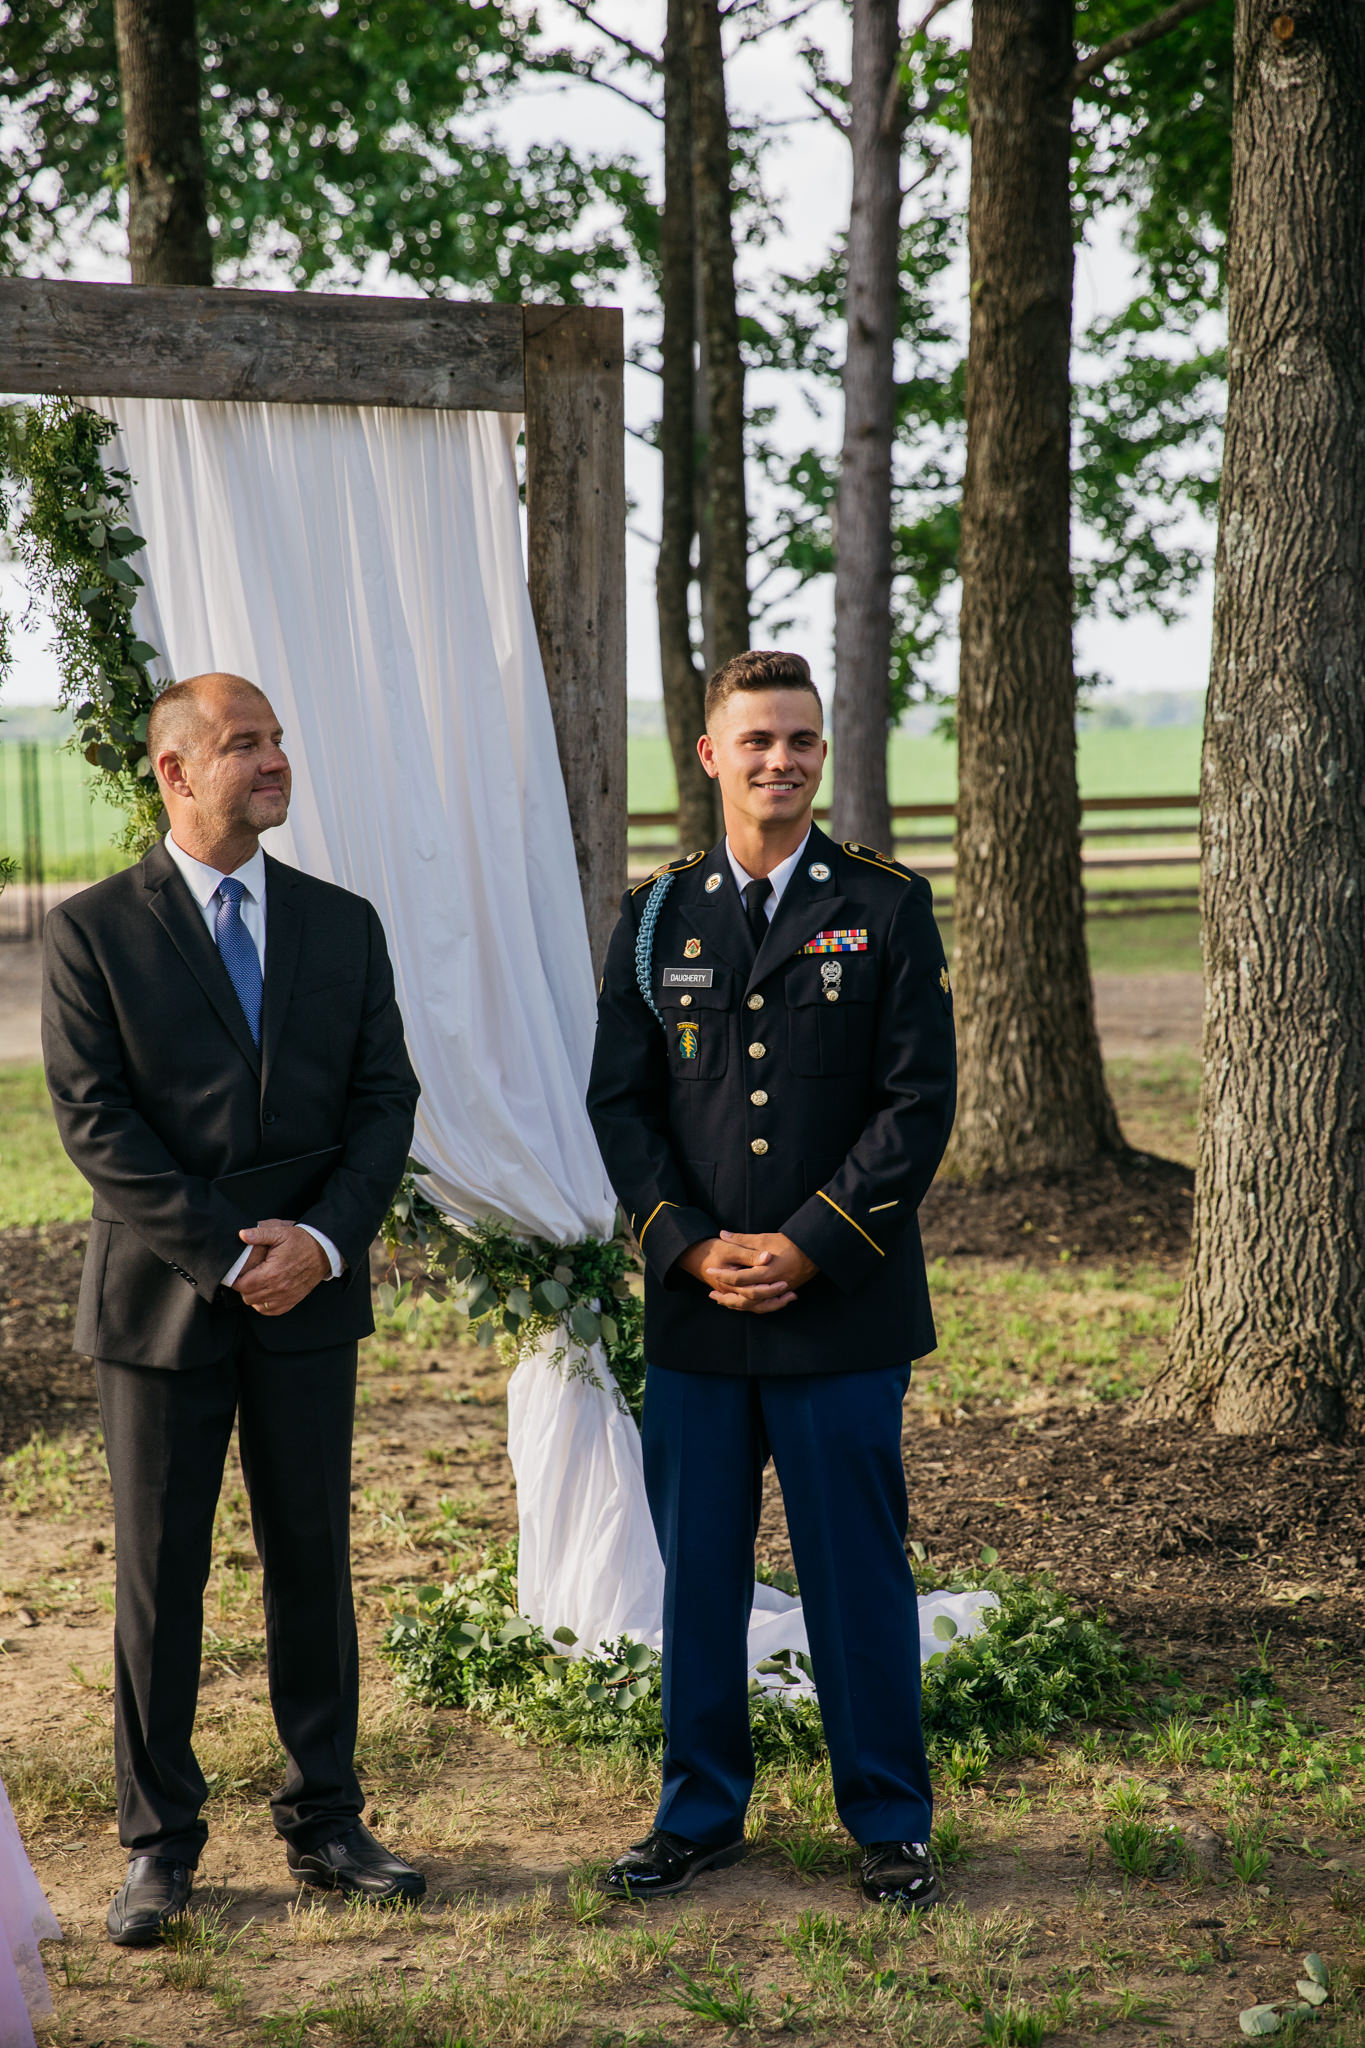 zbackyard-wedding-thewarmtharoundyou-lexy-branson-402.jpg